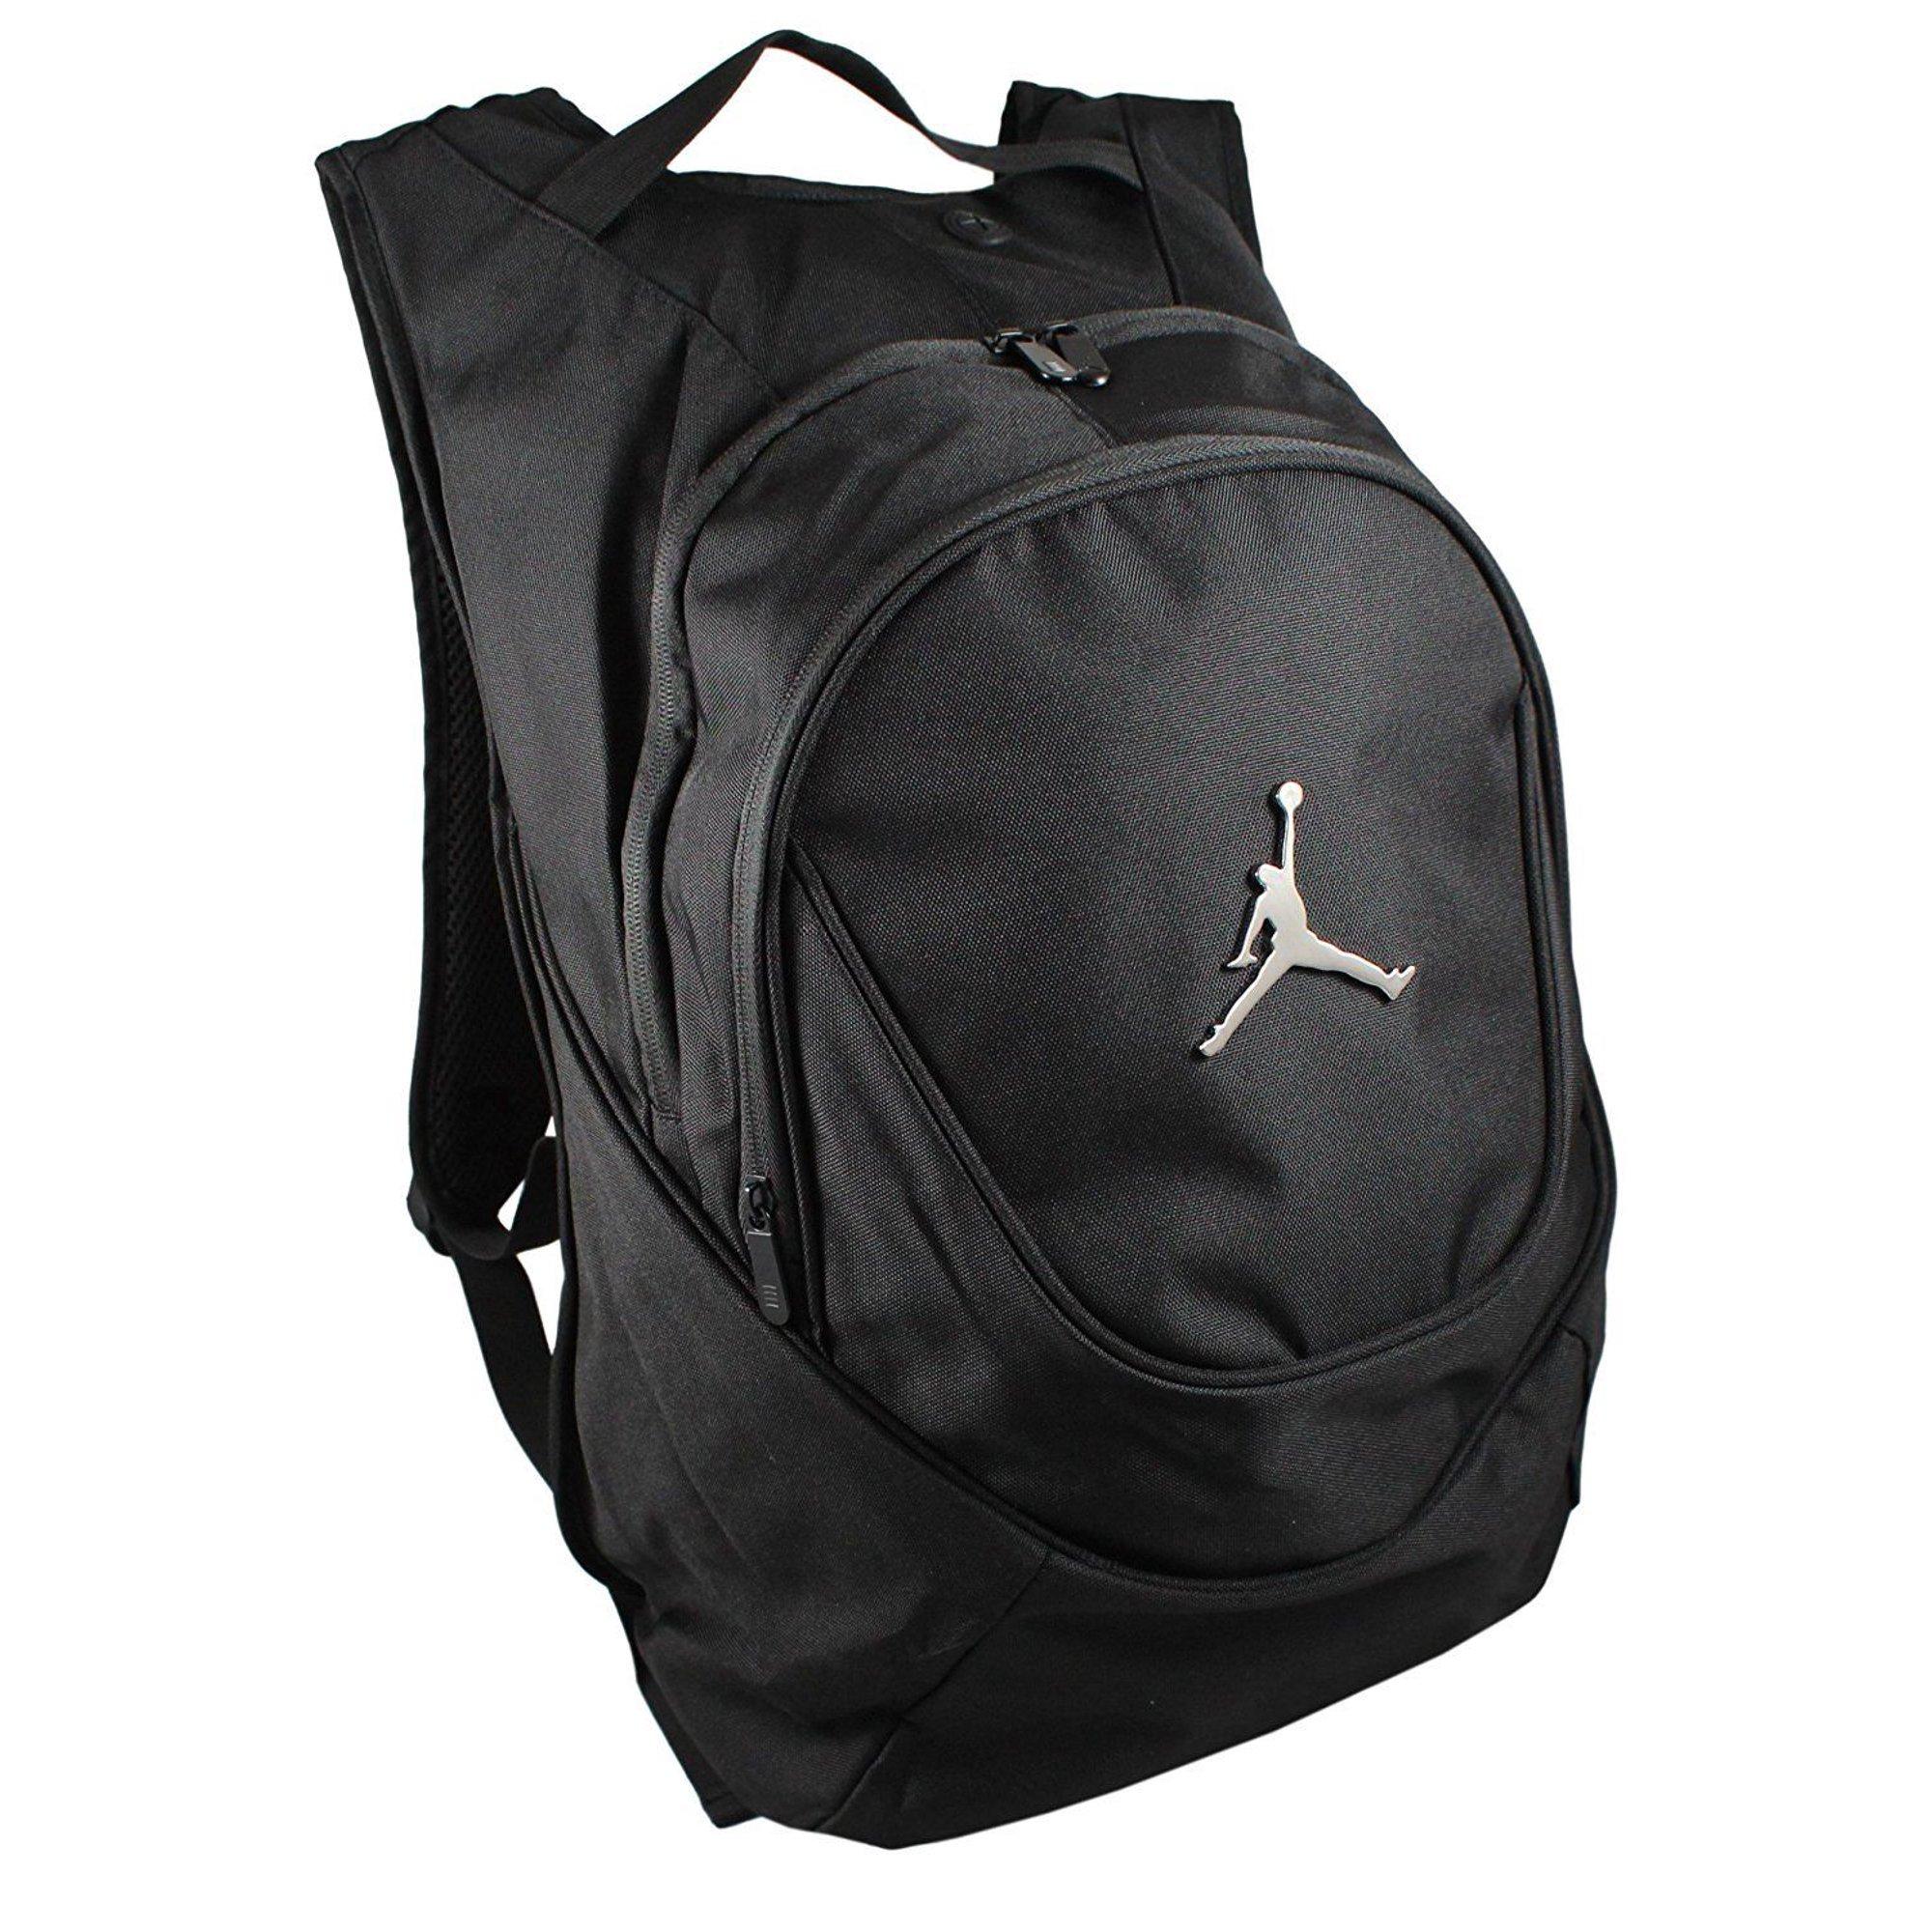 ada1801585 Buy Nike Jordan Jumpman 23 Round Shell Style Backpack - Black ...